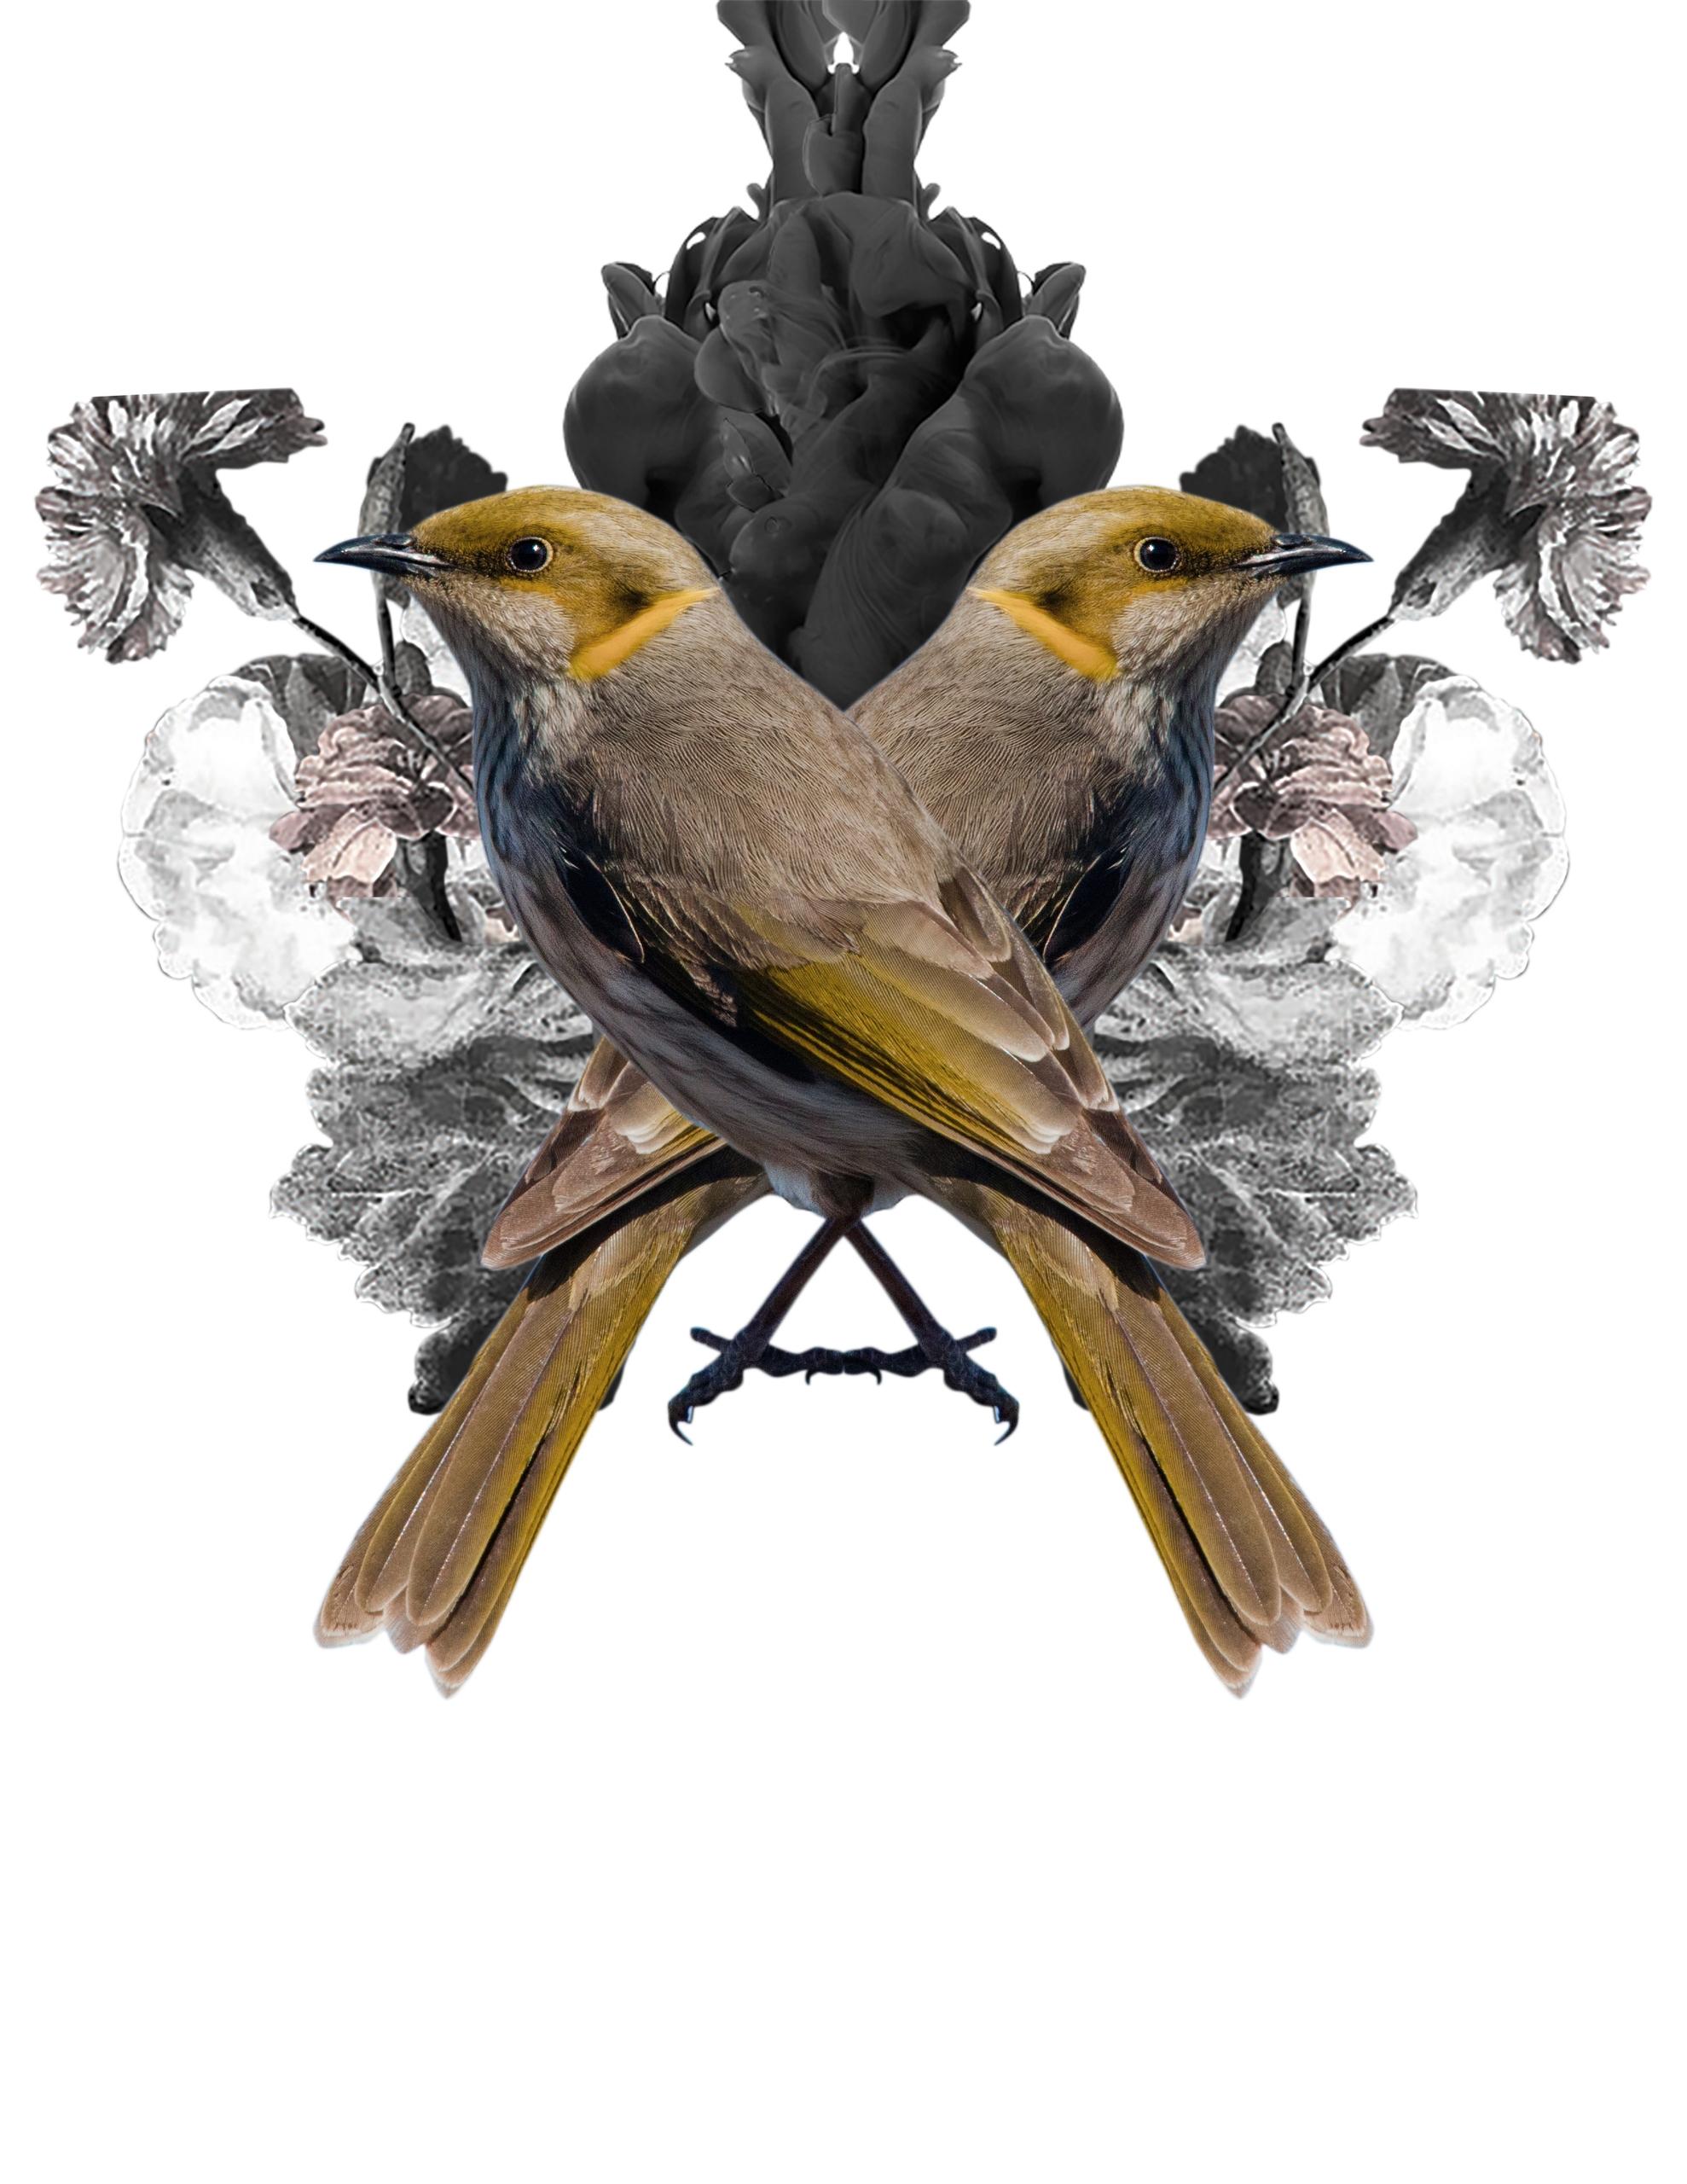 collage - digital - marianagv | ello